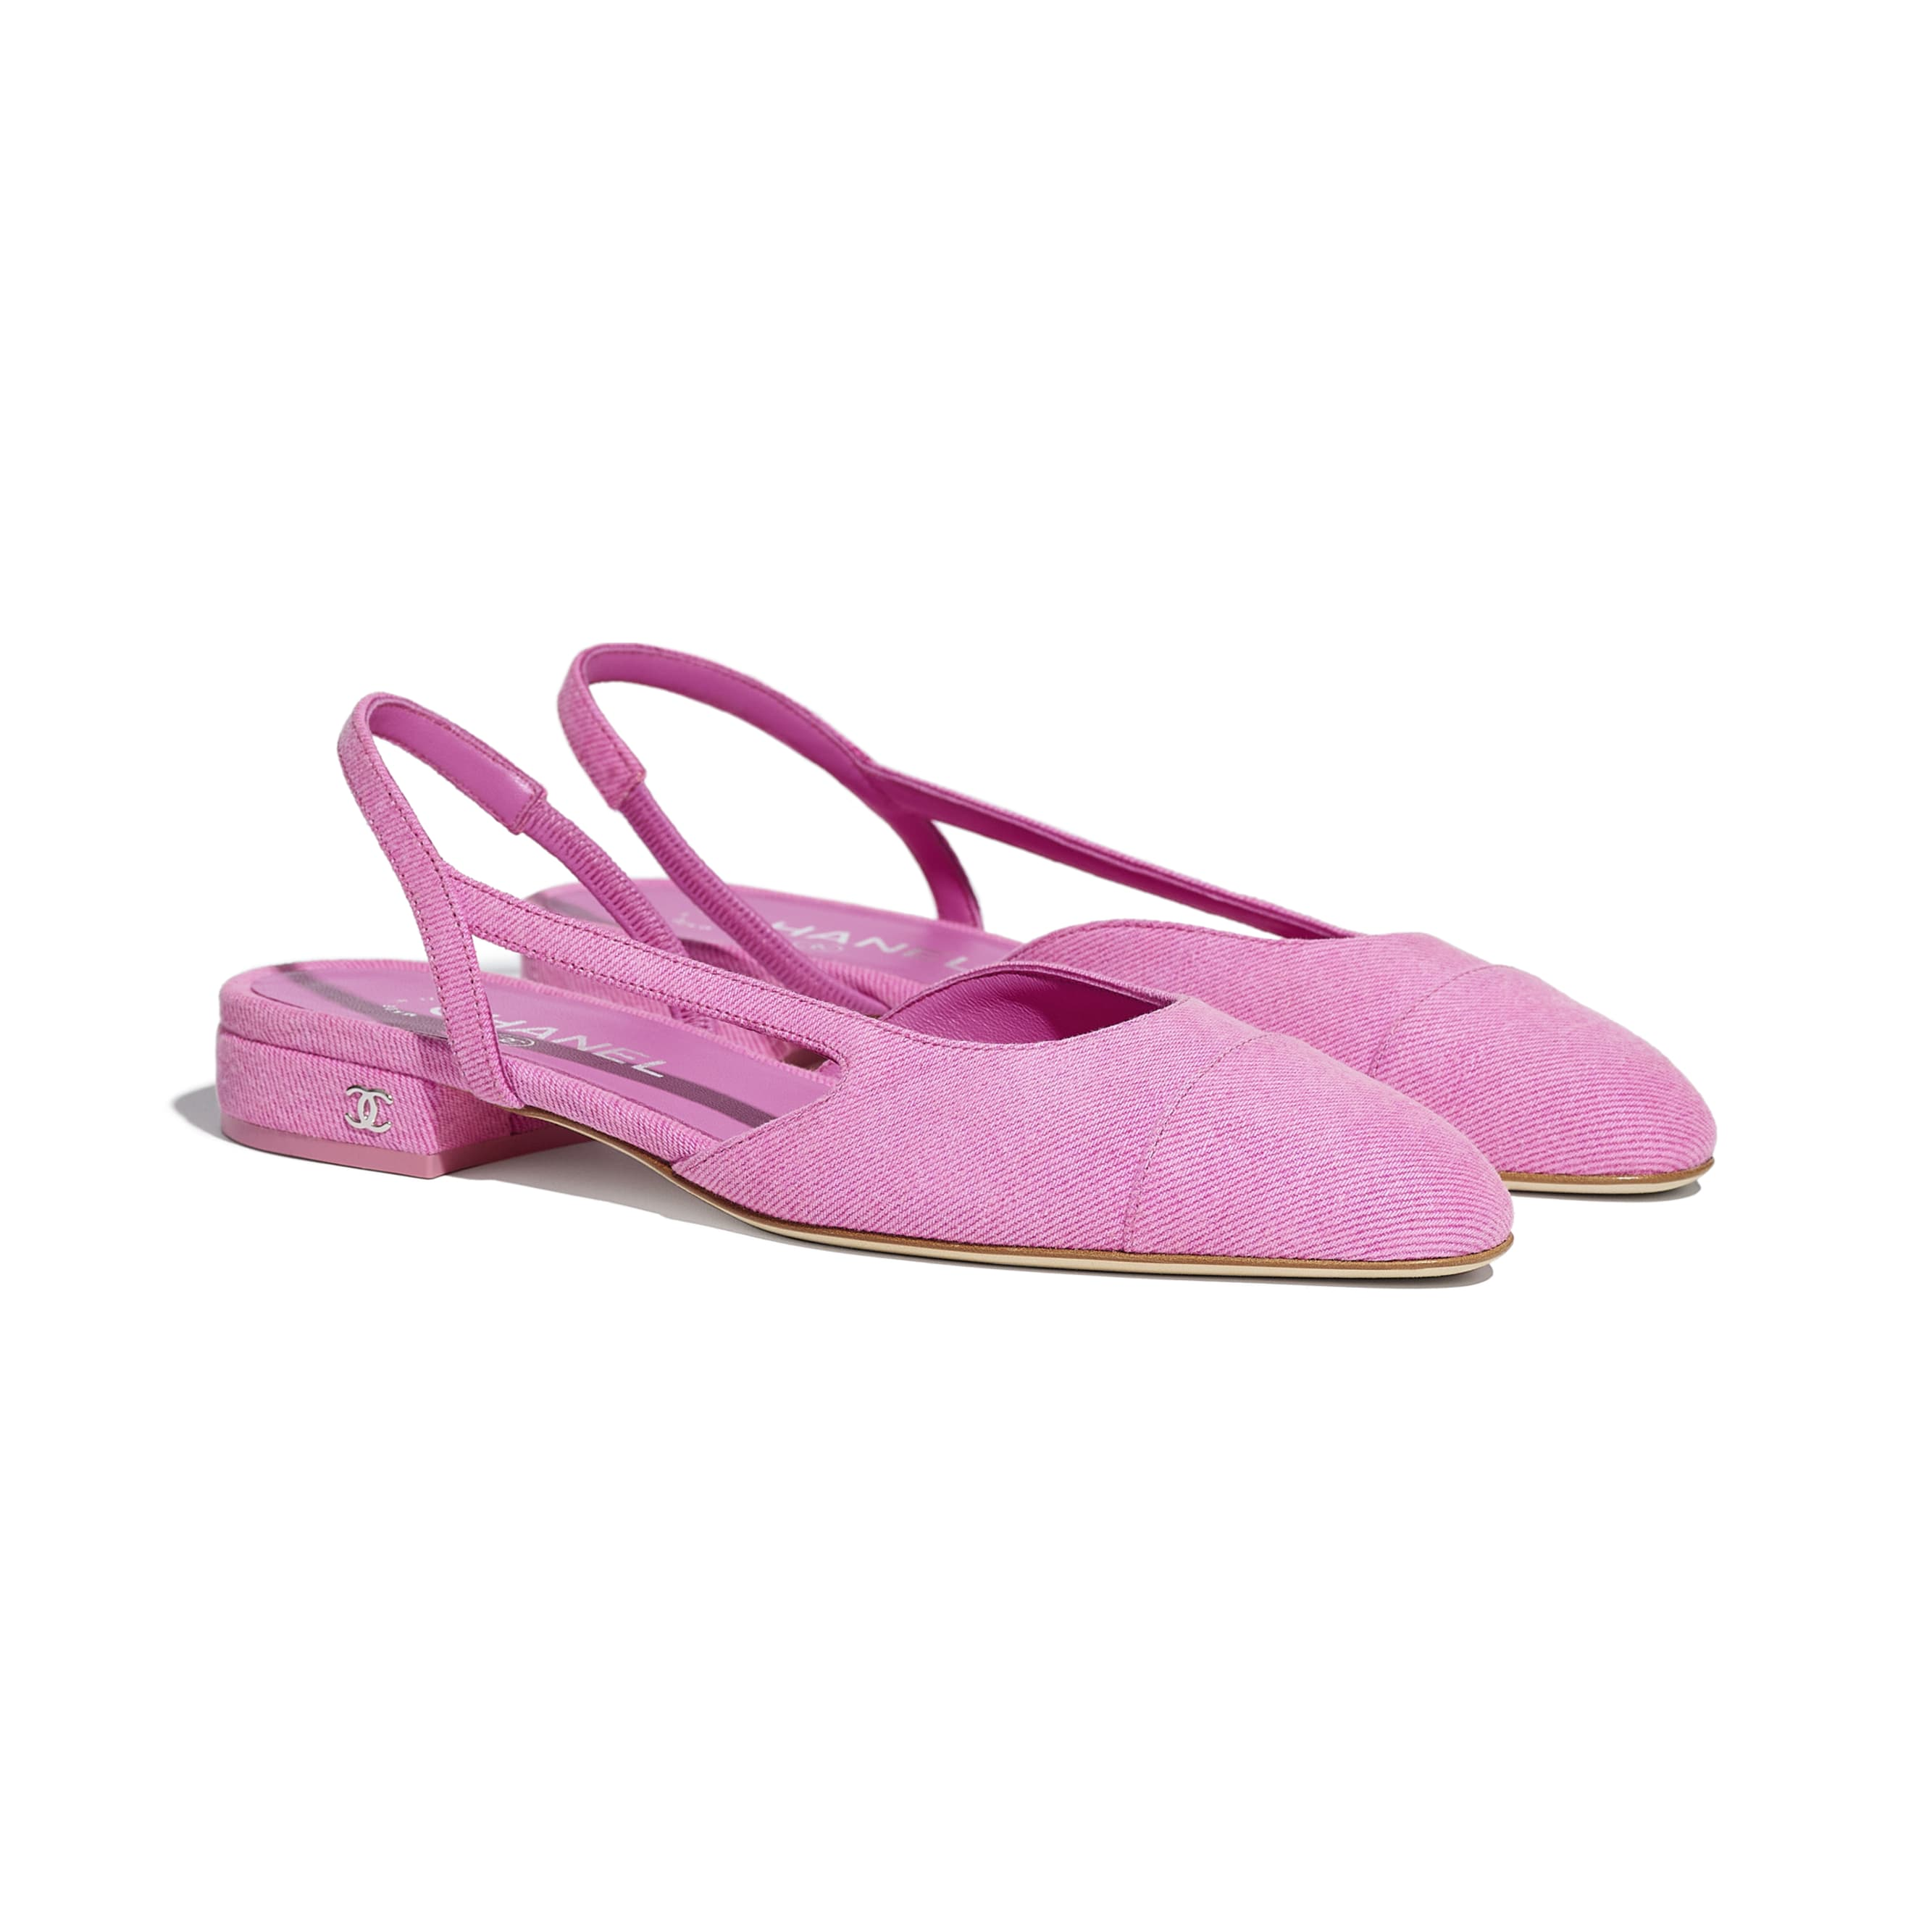 Sling-Back - Neon Pink - Denim - CHANEL - Alternative view - see standard sized version